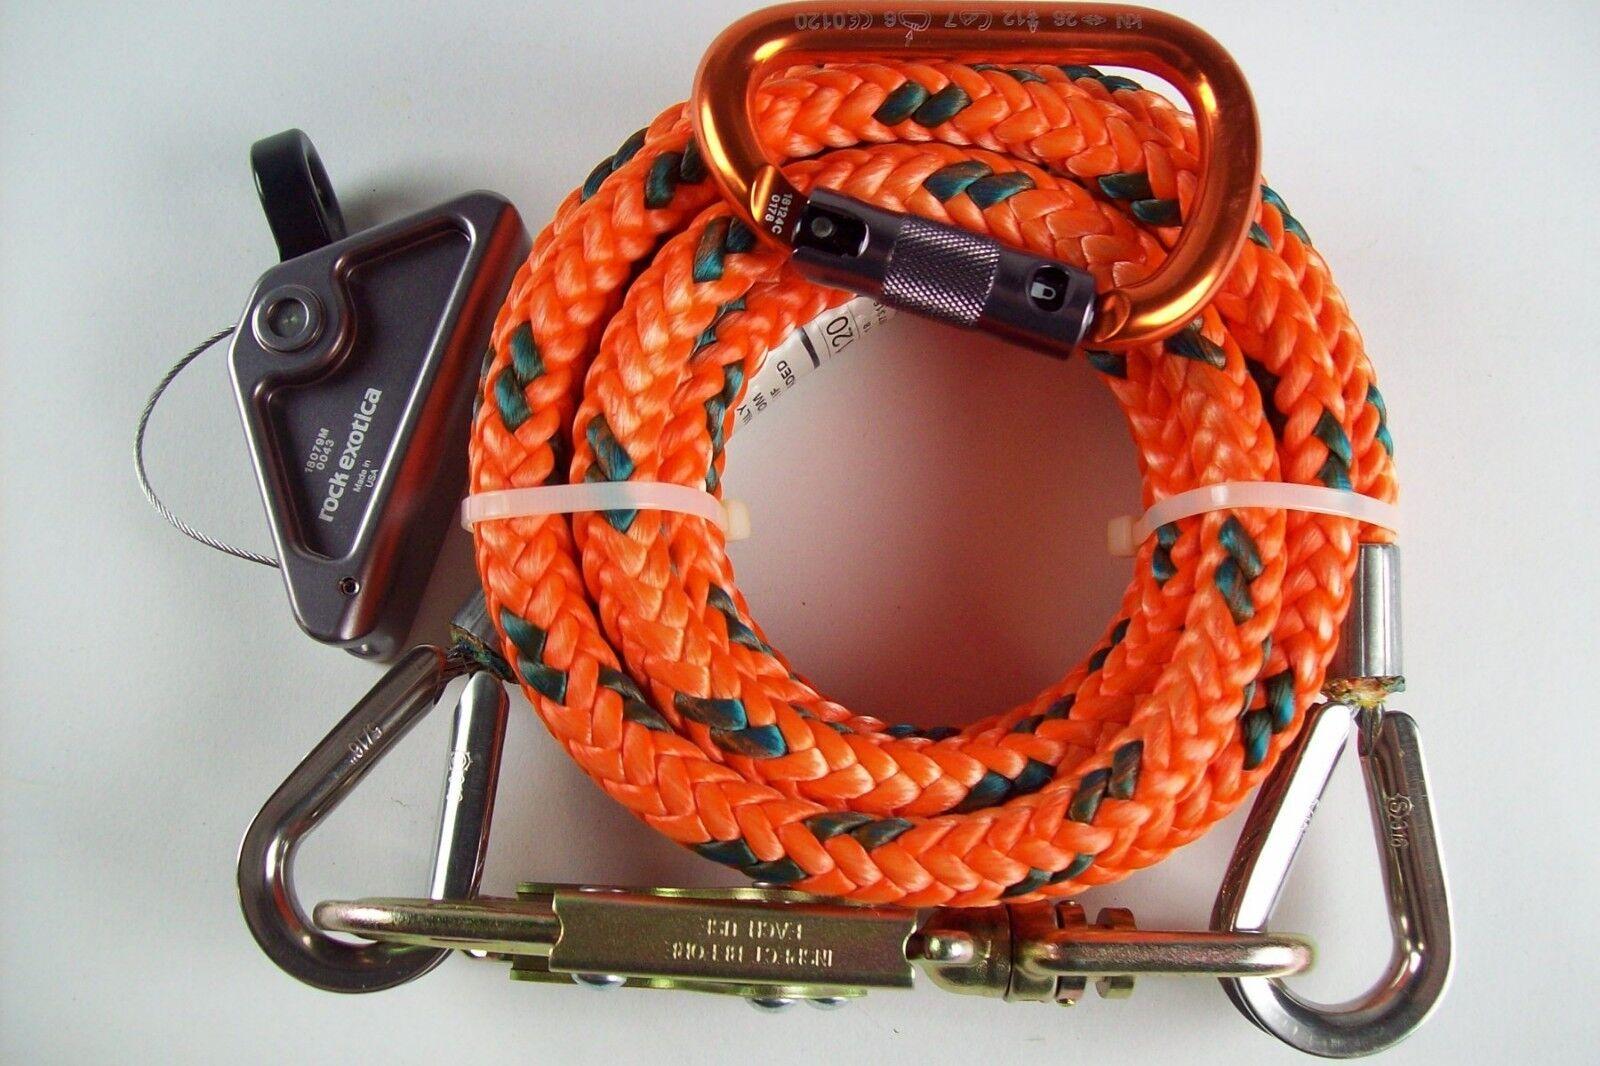 Arborist  Flipline Kit,1 2  x 10',Maxi-Flip (134K), Petzl Adjuster,Carabiner